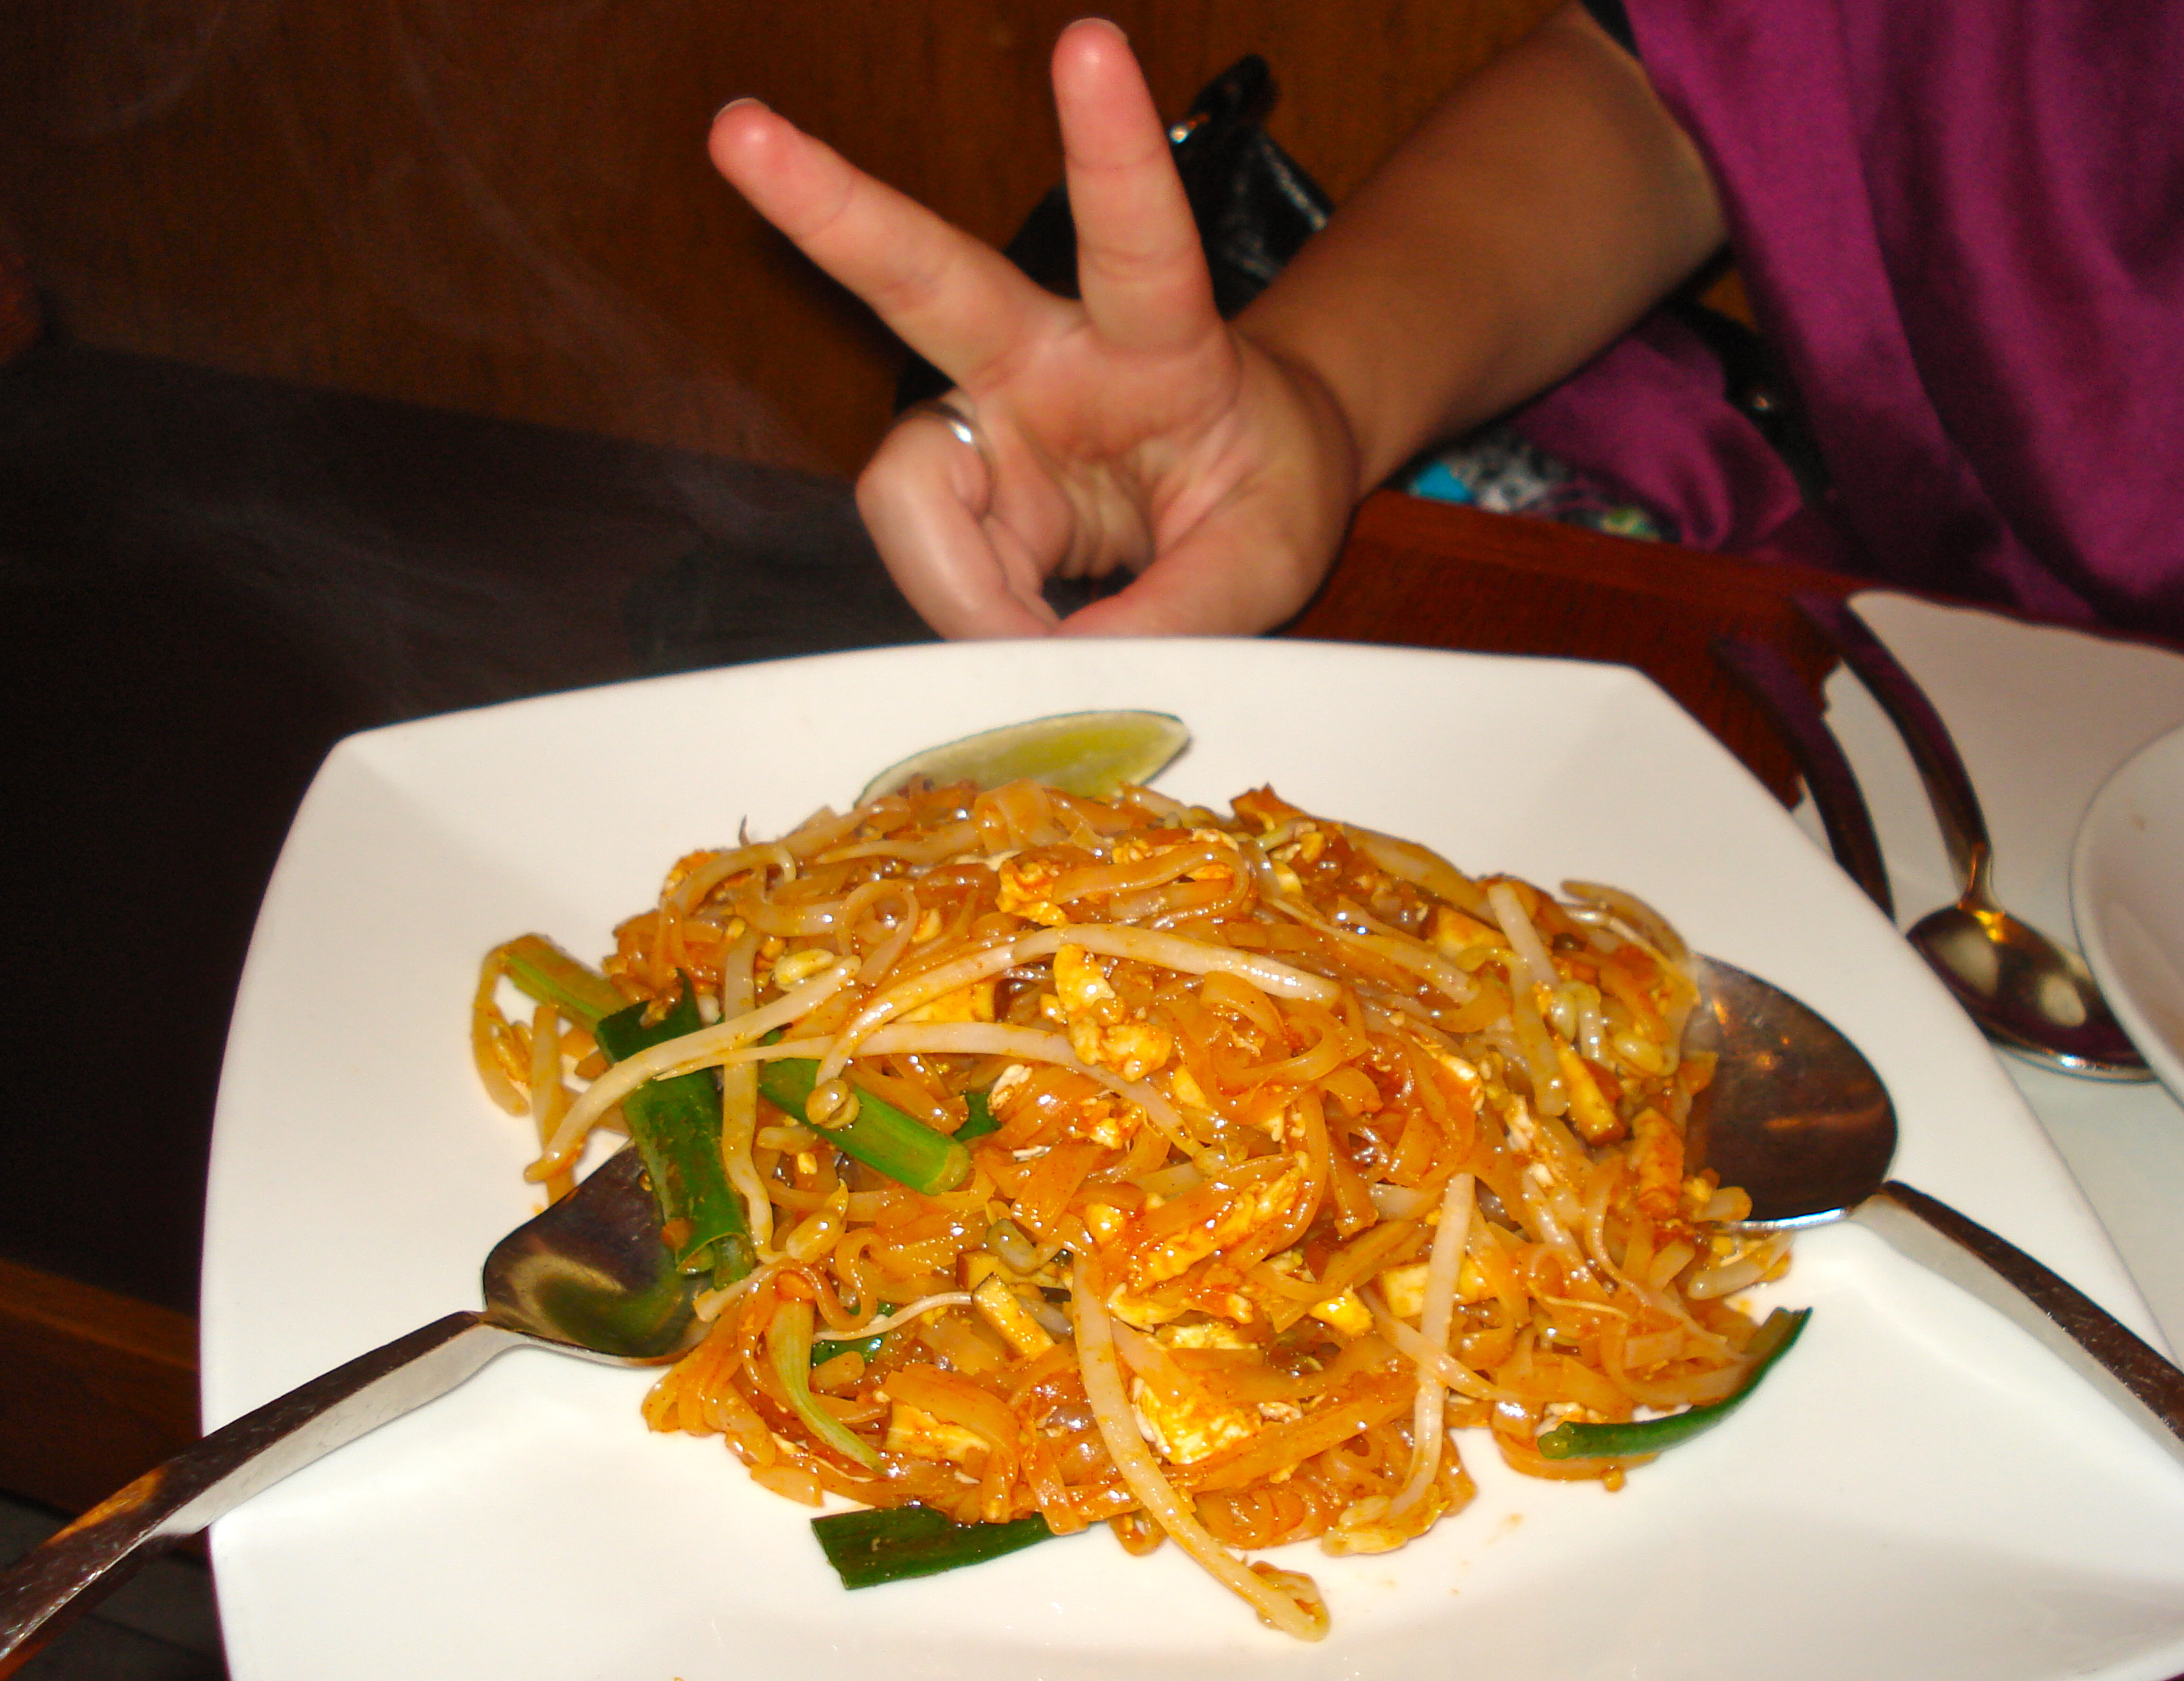 Pad thai for peace.